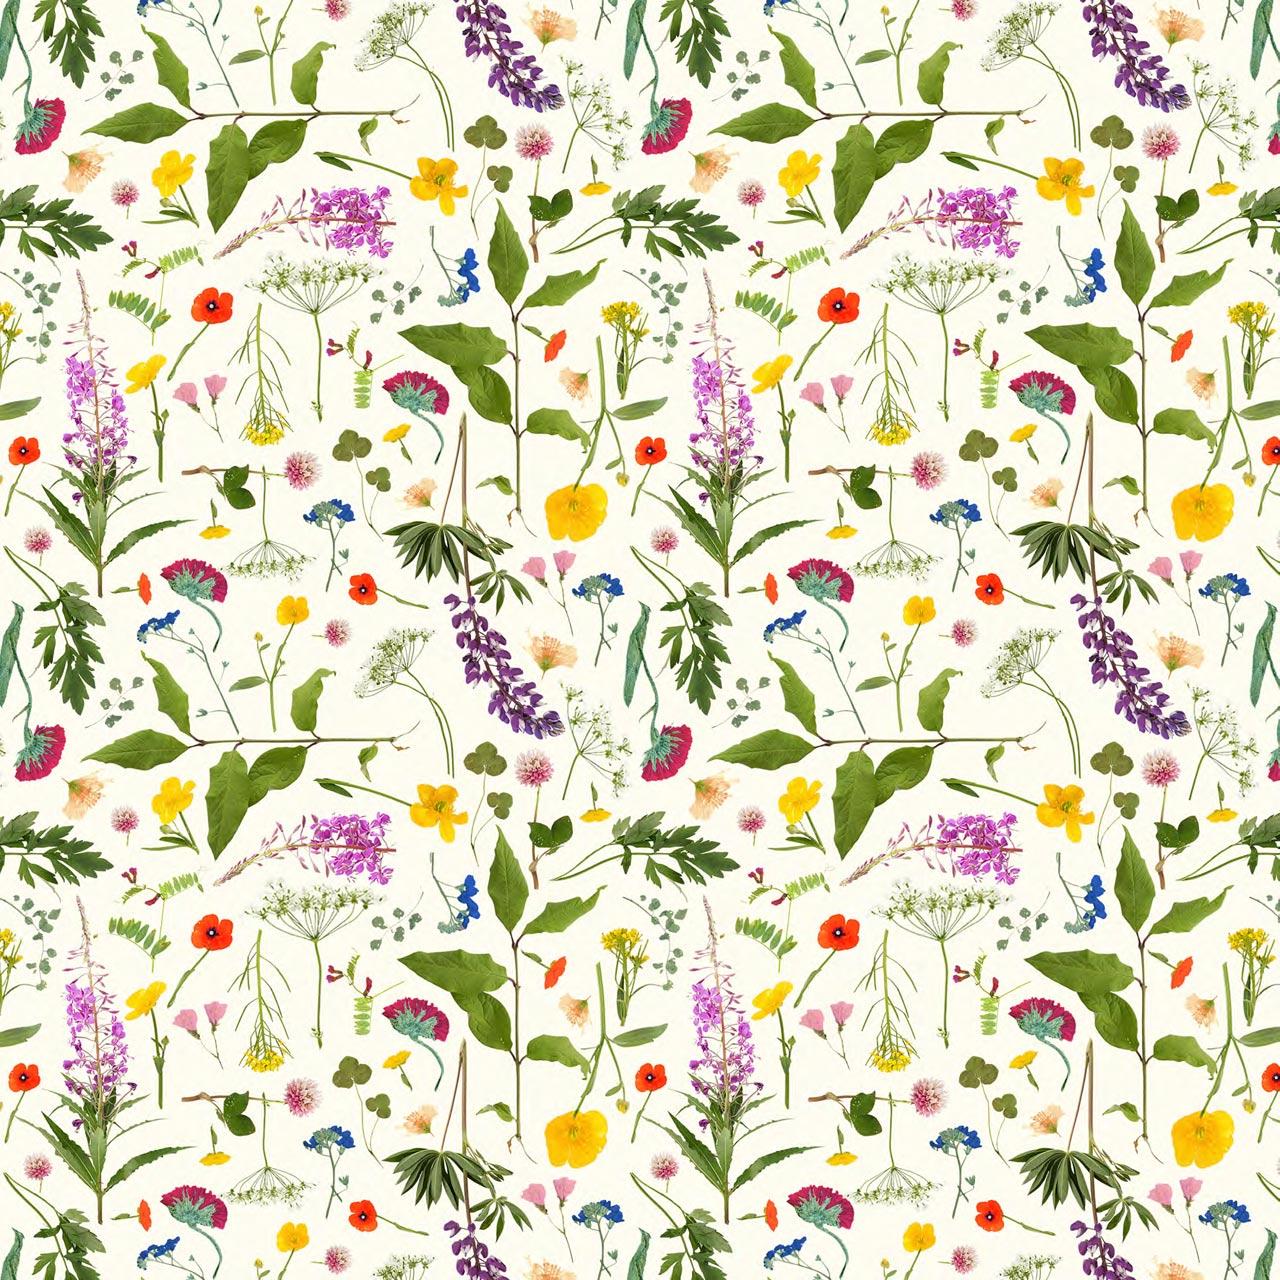 ivana helsinki nordic wildflowers collection